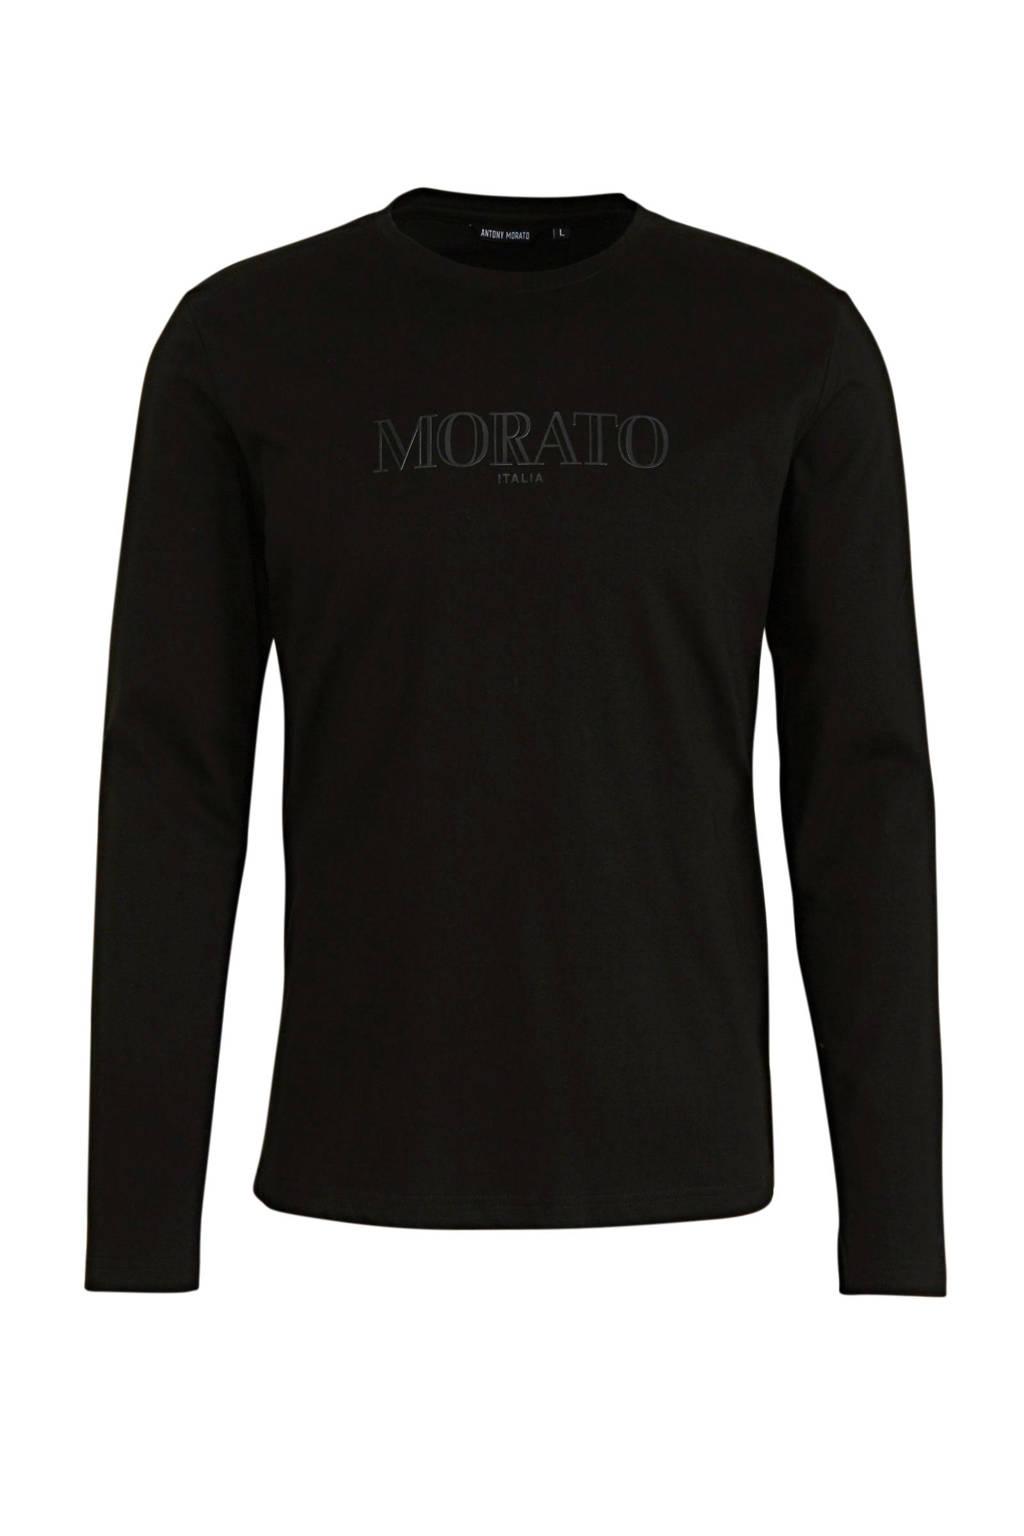 Antony Morato longsleeve met logo zwart, Zwart